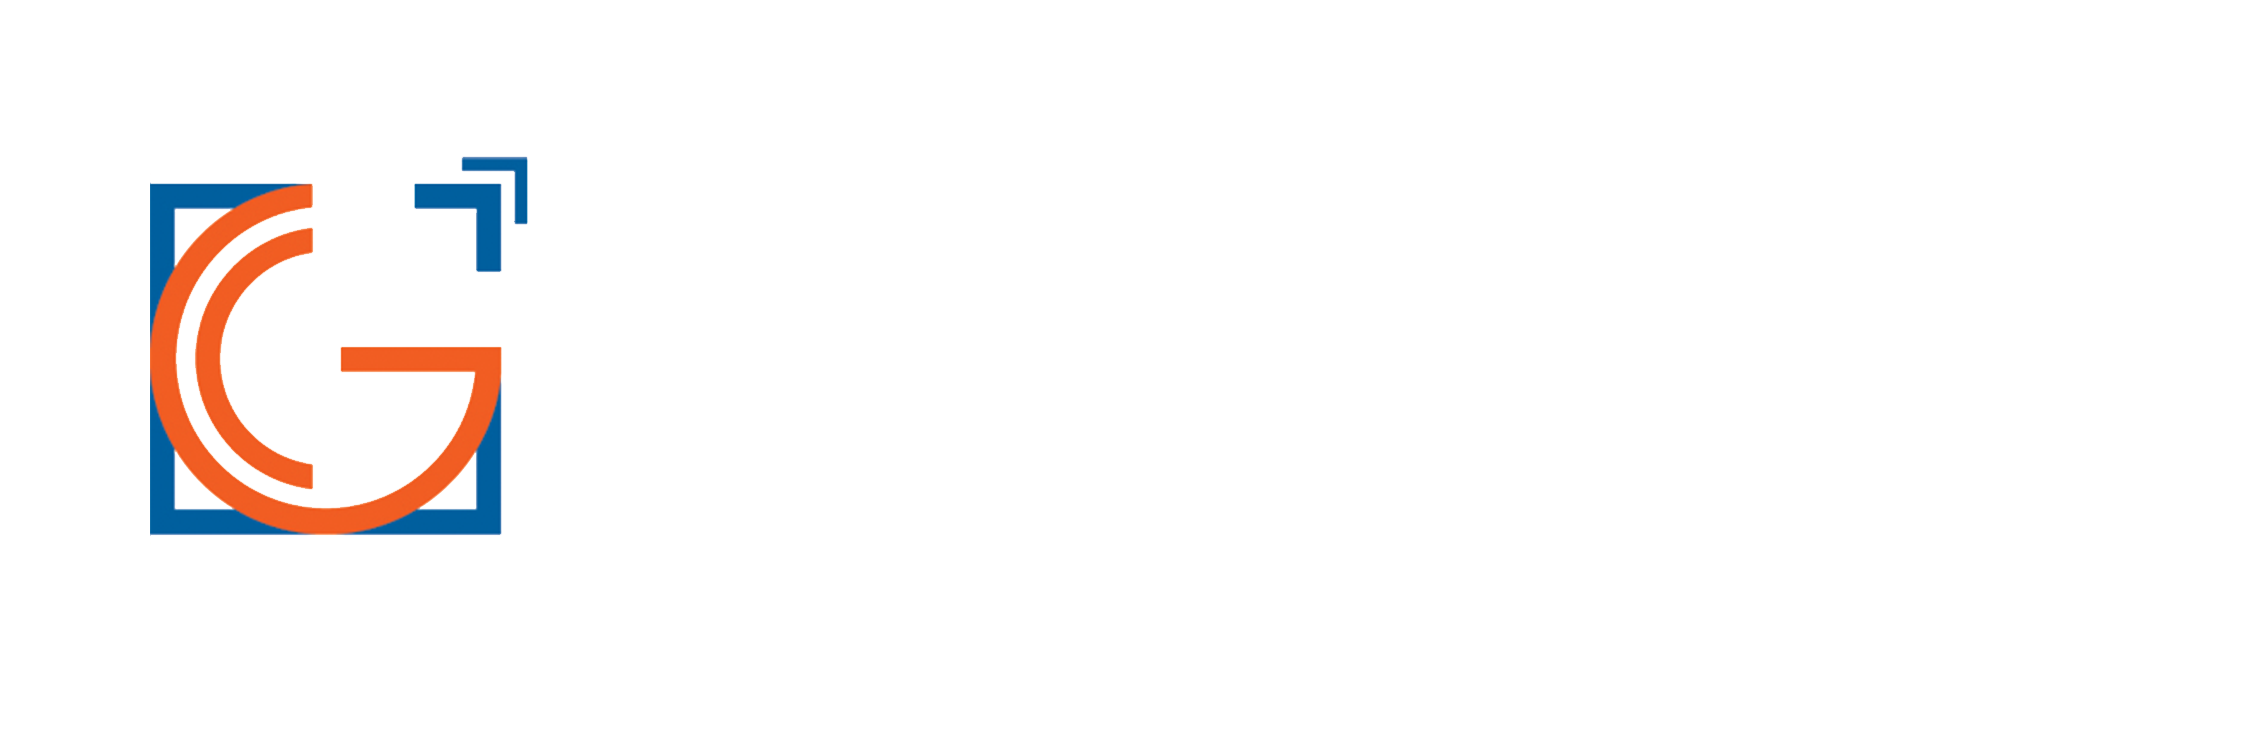 Explore | Design | Navigate